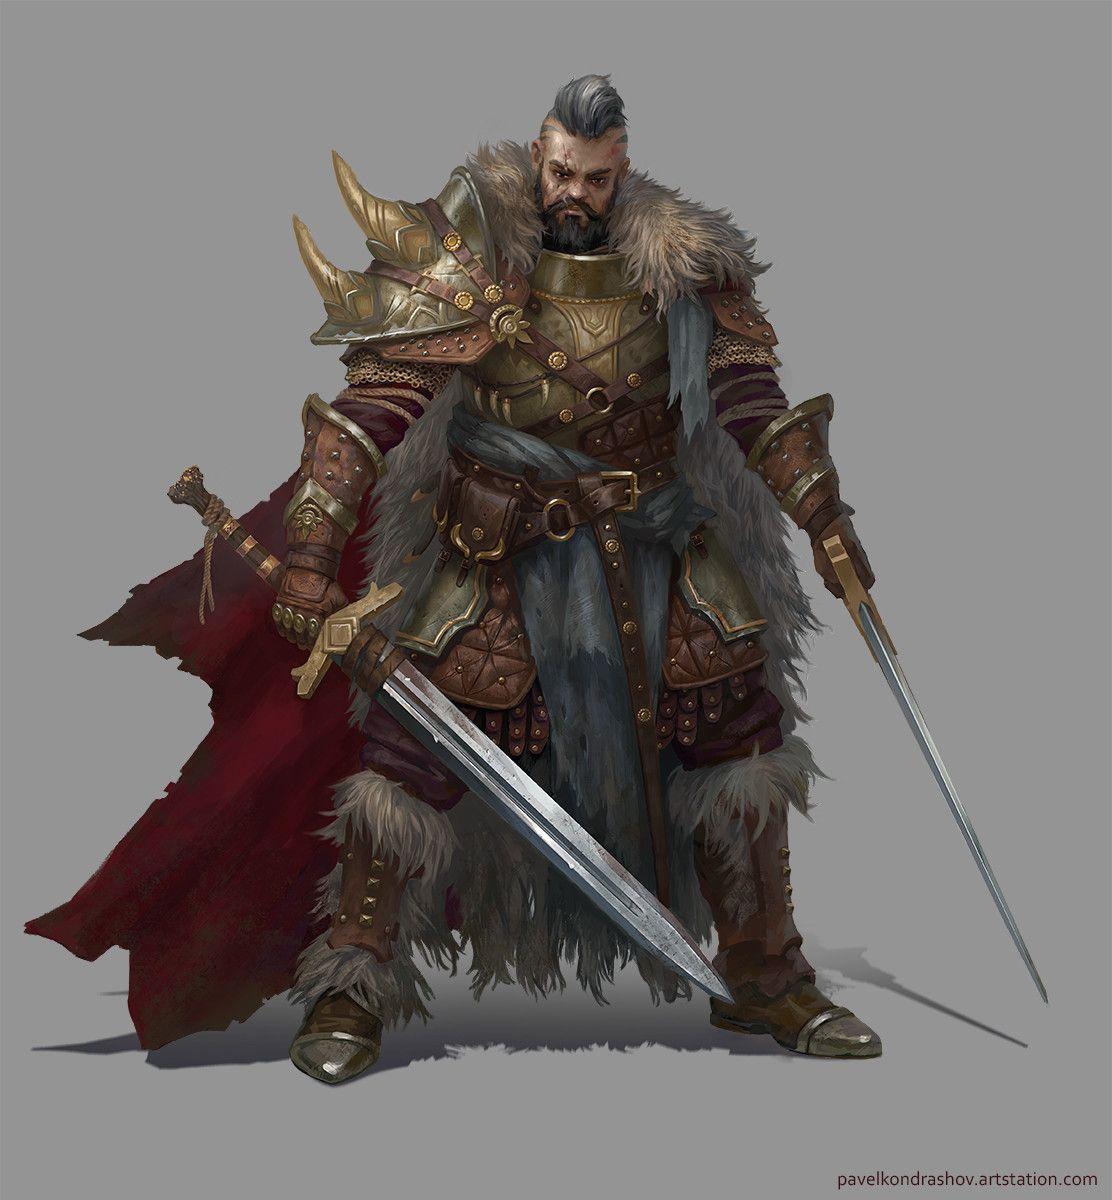 The warrior pavel kondrashov on artstation at